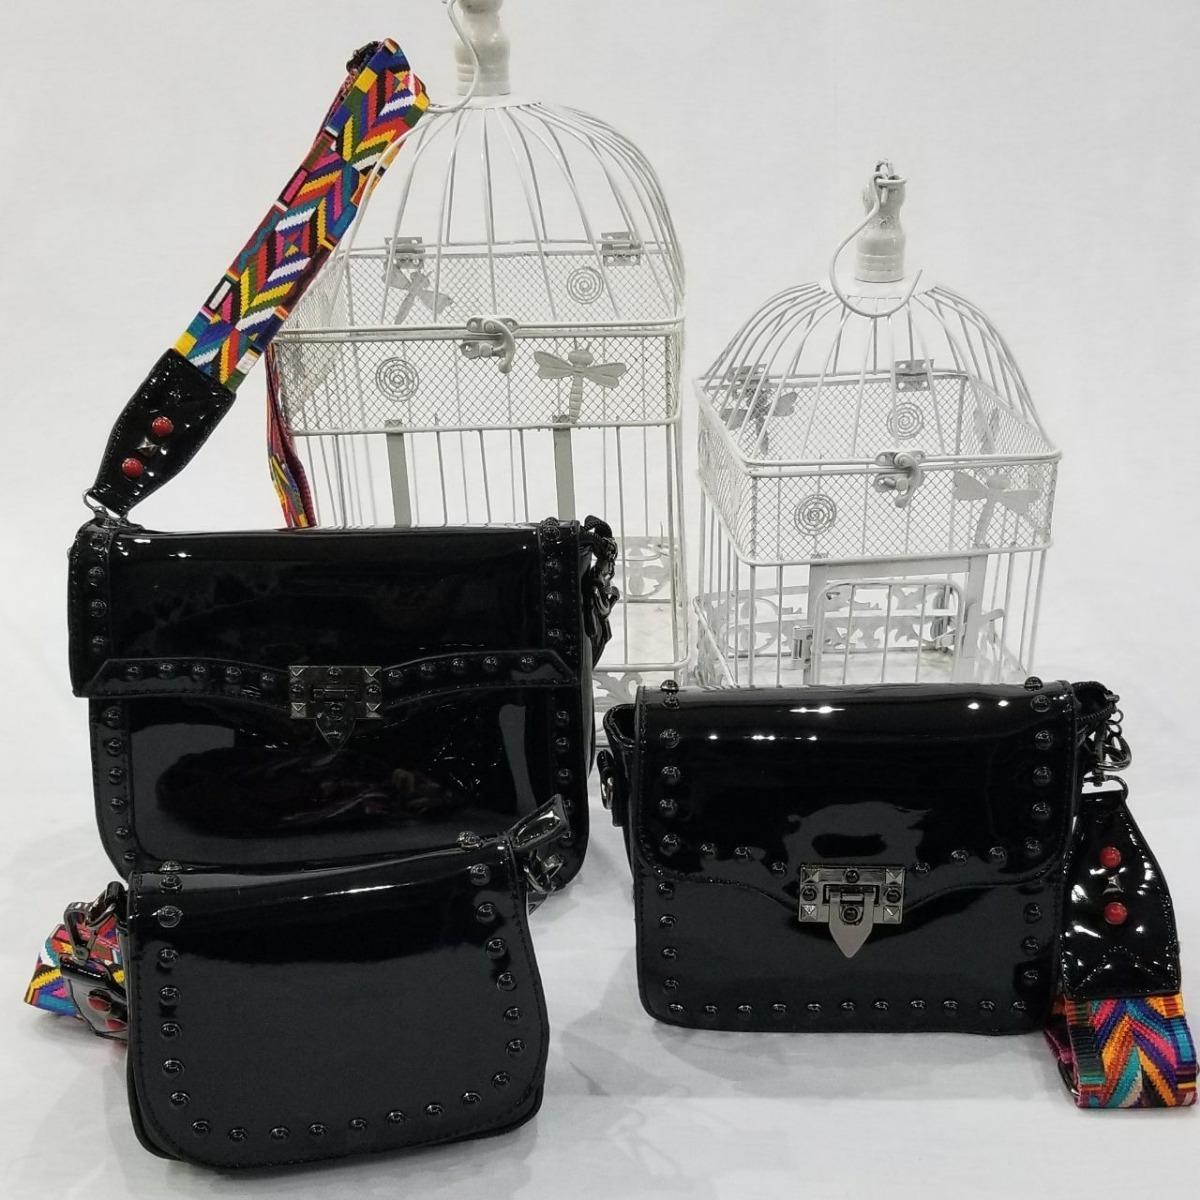 df552a520 Kit Com 3 Bolsas Inspired Valentino Transversal Colorida - R$ 199,90 ...